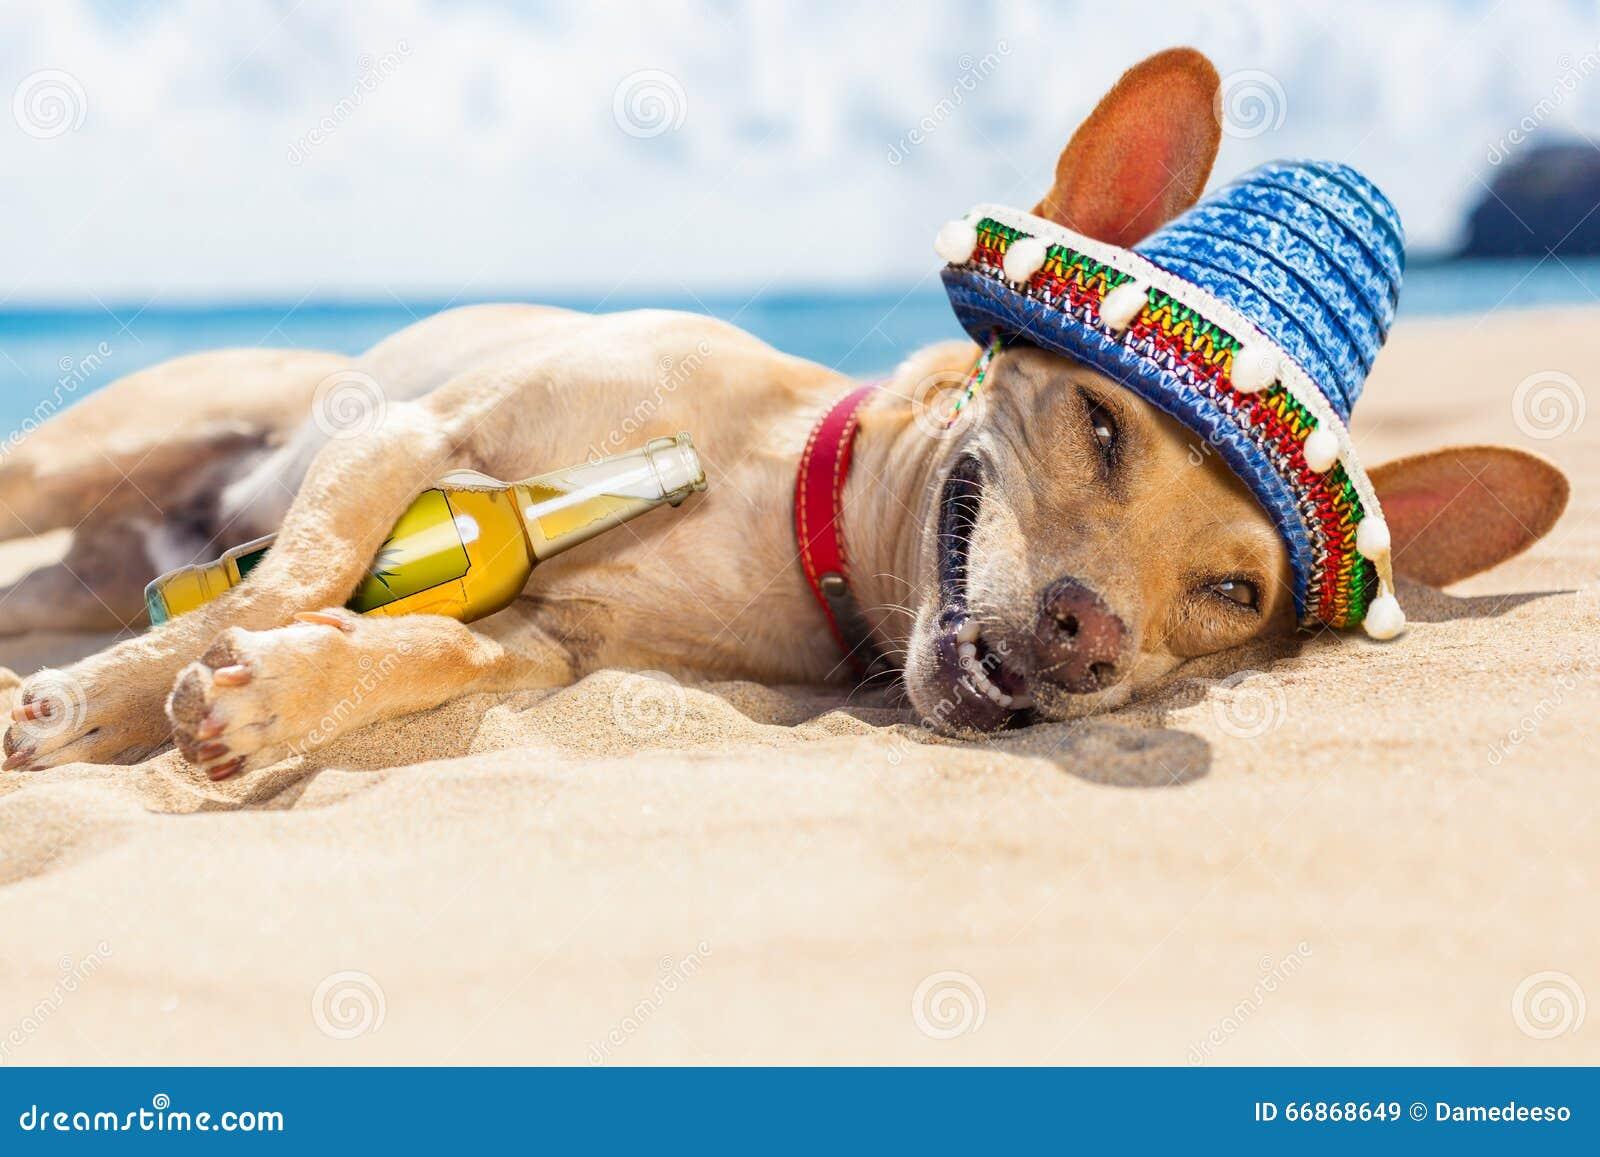 Ocean Beach Dogs